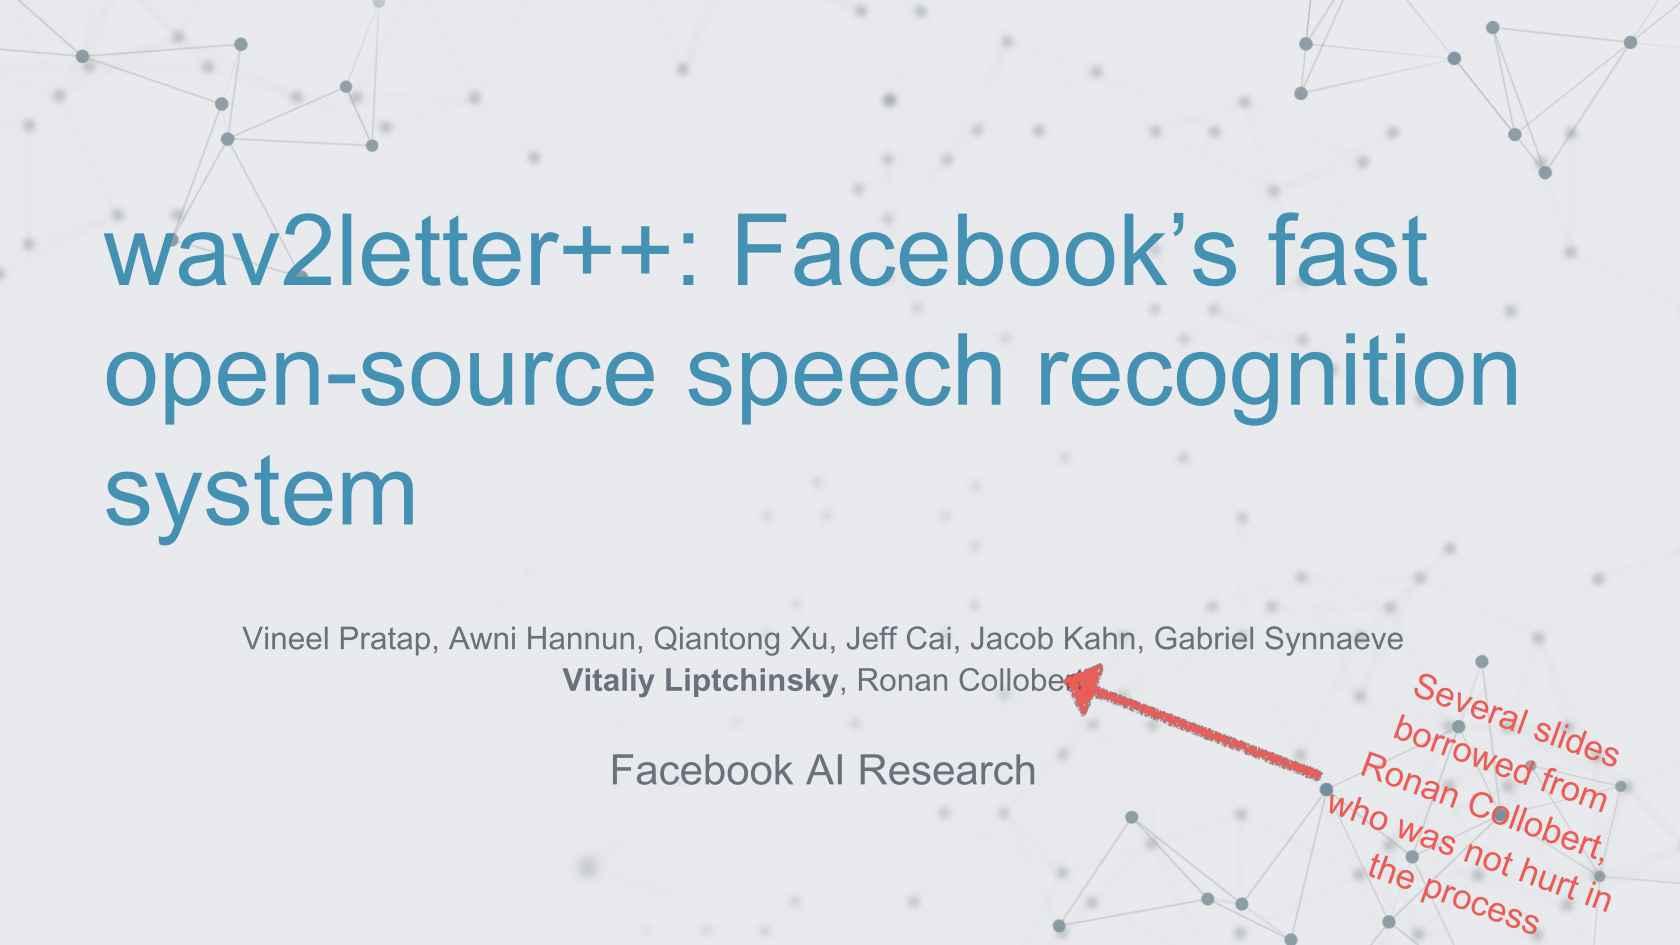 wav2letter++: Facebook's Fast Open-Source Speech Recognition